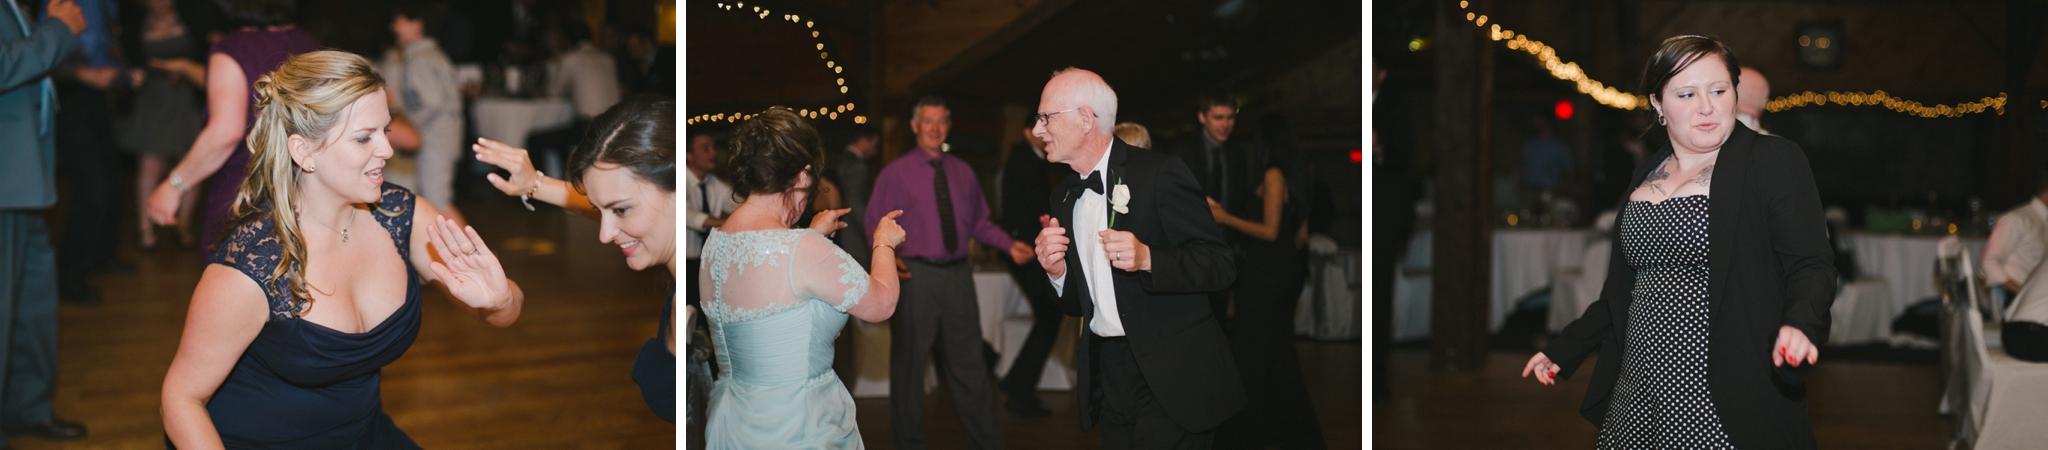 53-wedding-dance-reception-at-hernder.jpg